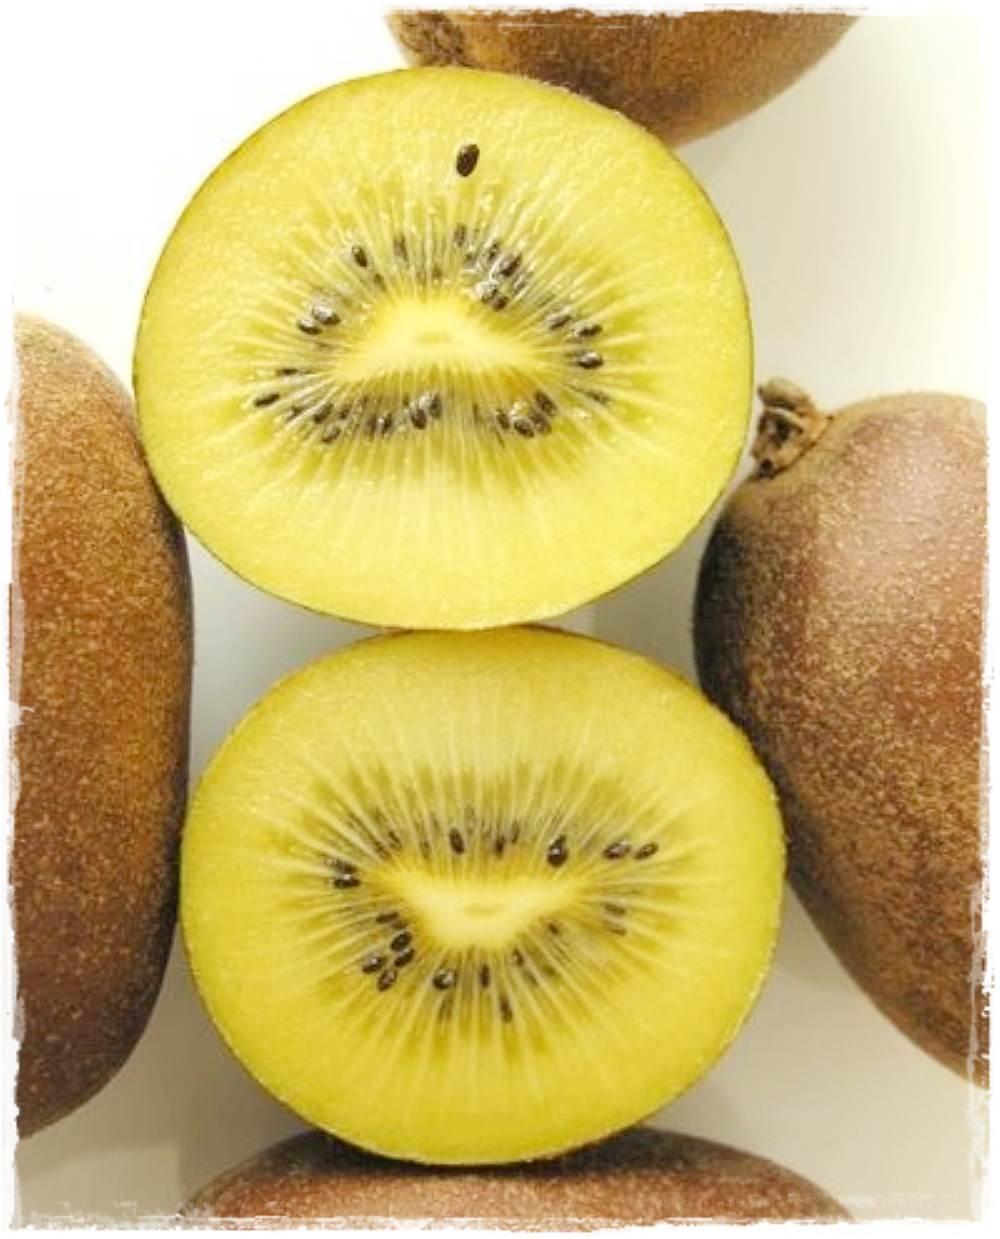 Kiwi giallo 39 golden delight 39 vendita piante online for Kiwi giallo piante acquisto